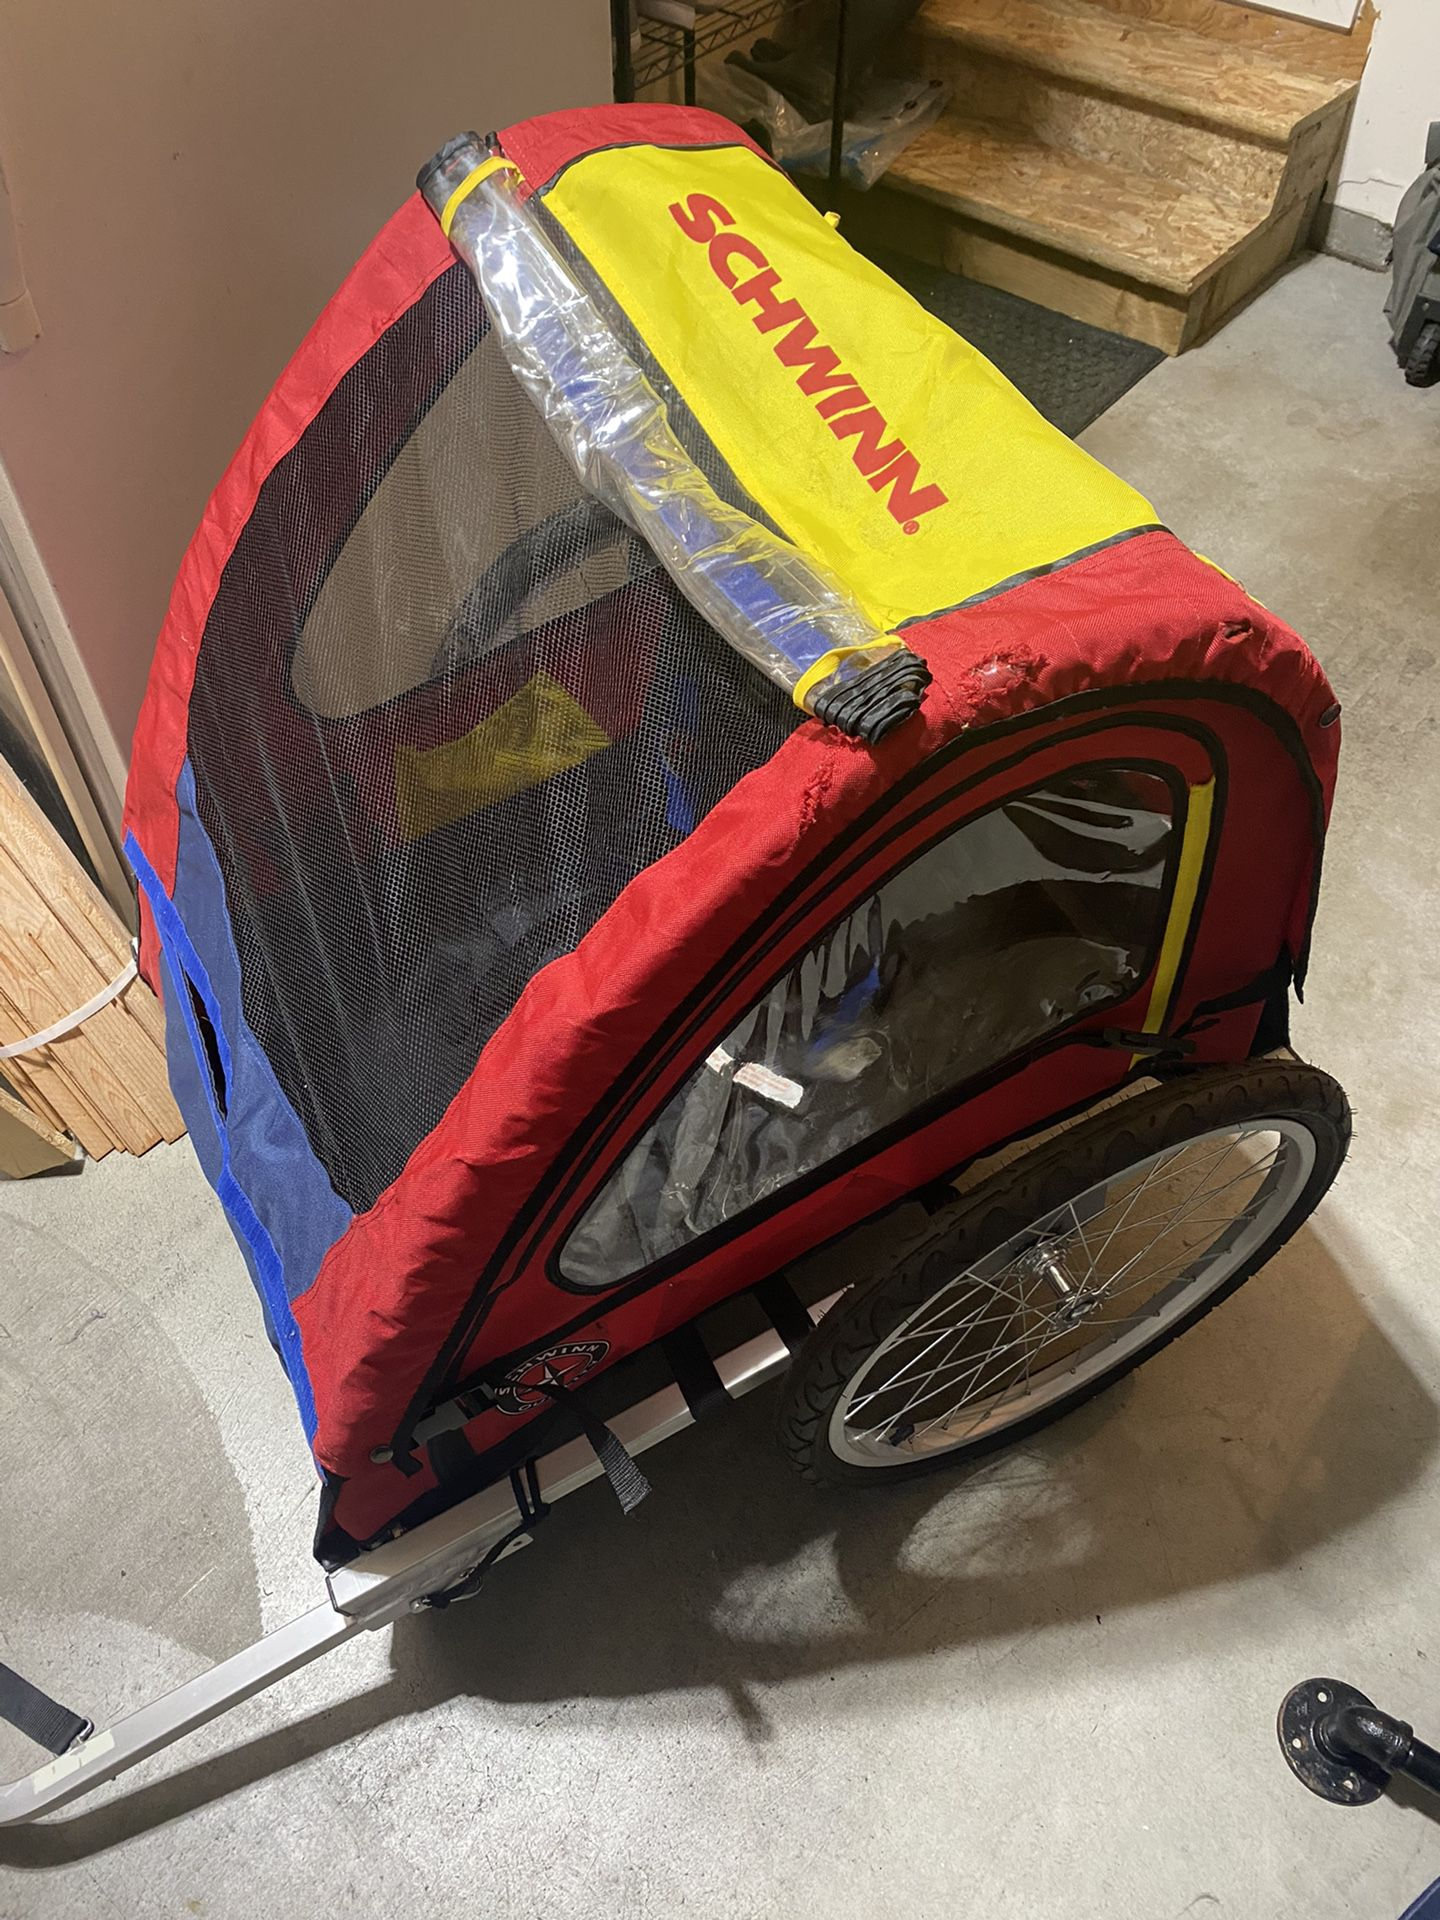 Schwinn Bicycle Stroller